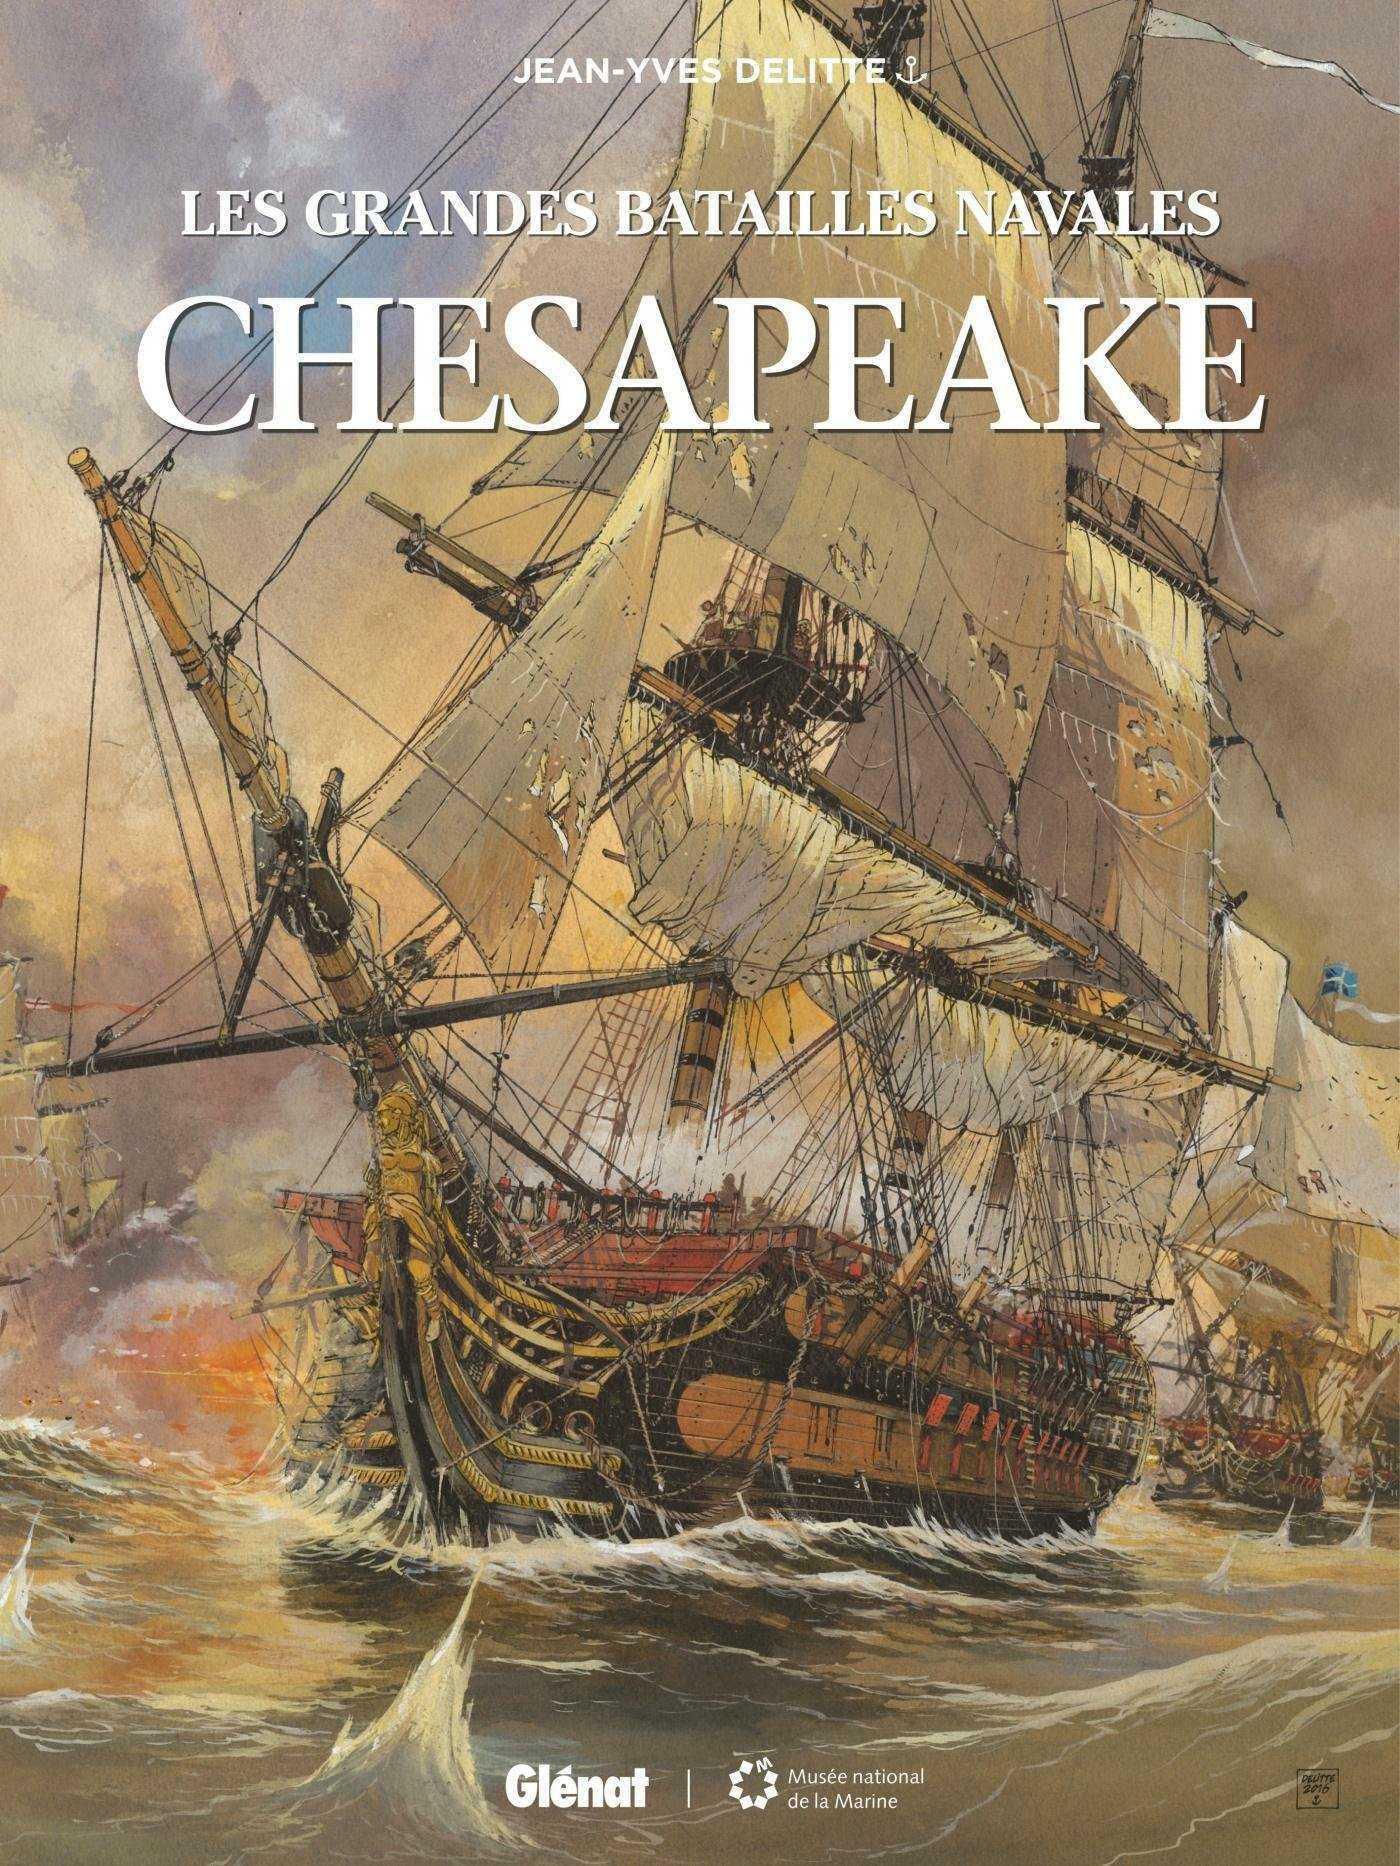 Les Grandes Batailles navales, Chesapeake, Trafalgar et Jutland avec Delitte